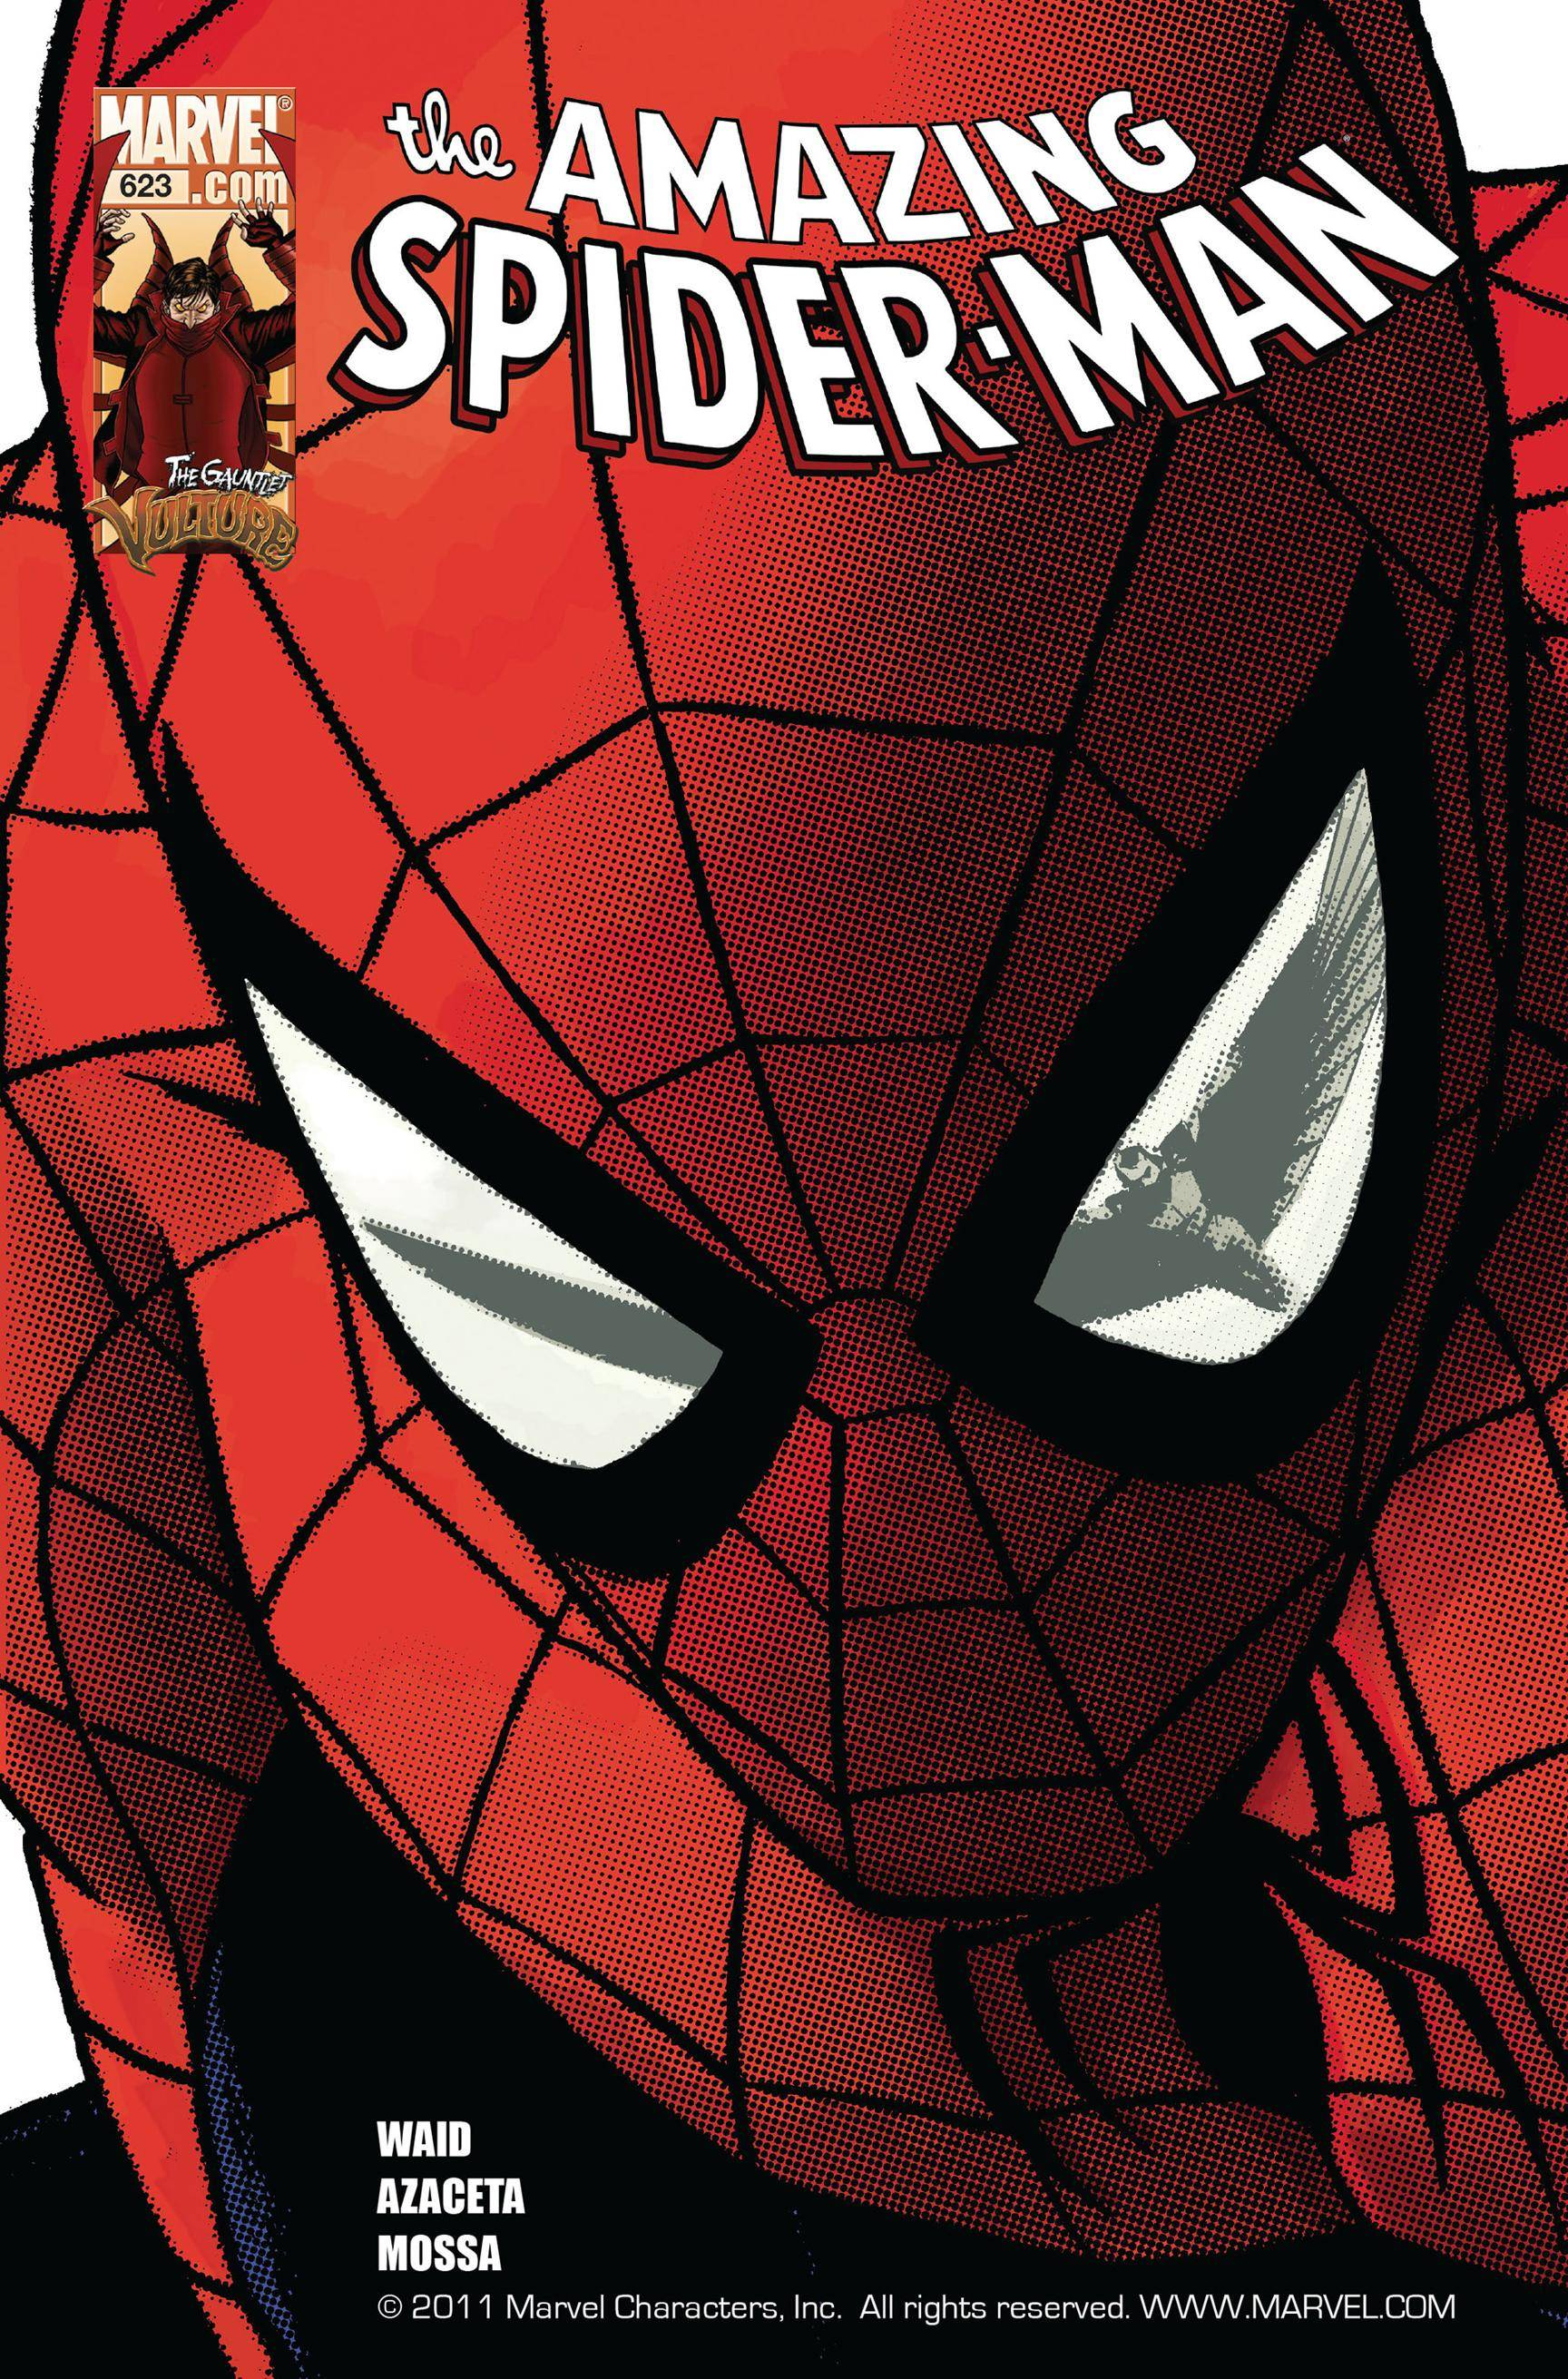 Amazing Spider-Man v1 623 Marvel 2010 Digital